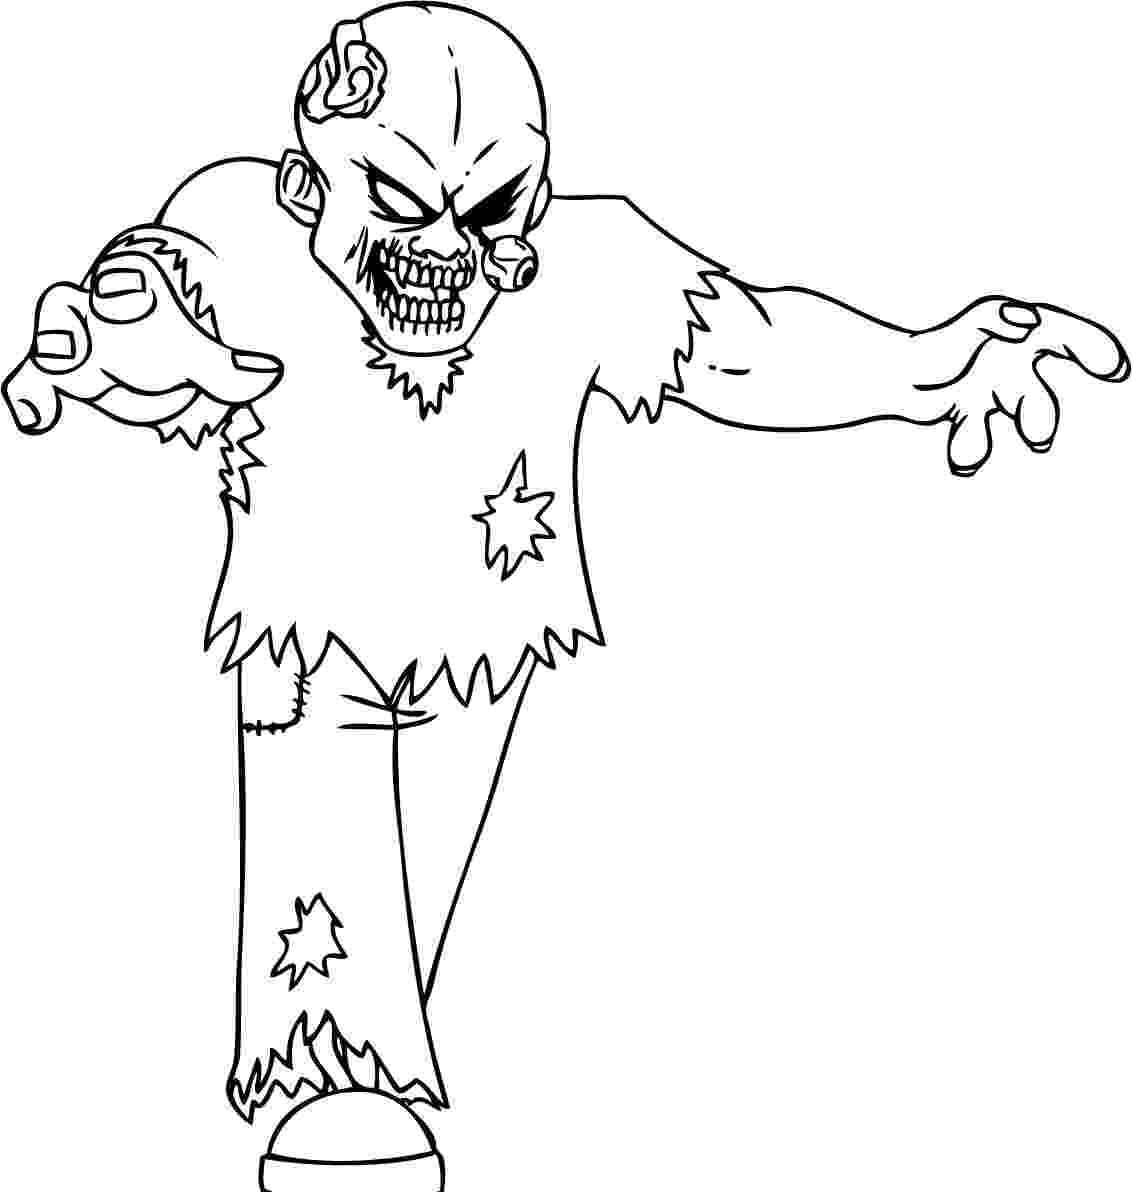 zombie coloring sheets printable halloween zombie coloring pages getcoloringpagescom coloring zombie printable sheets